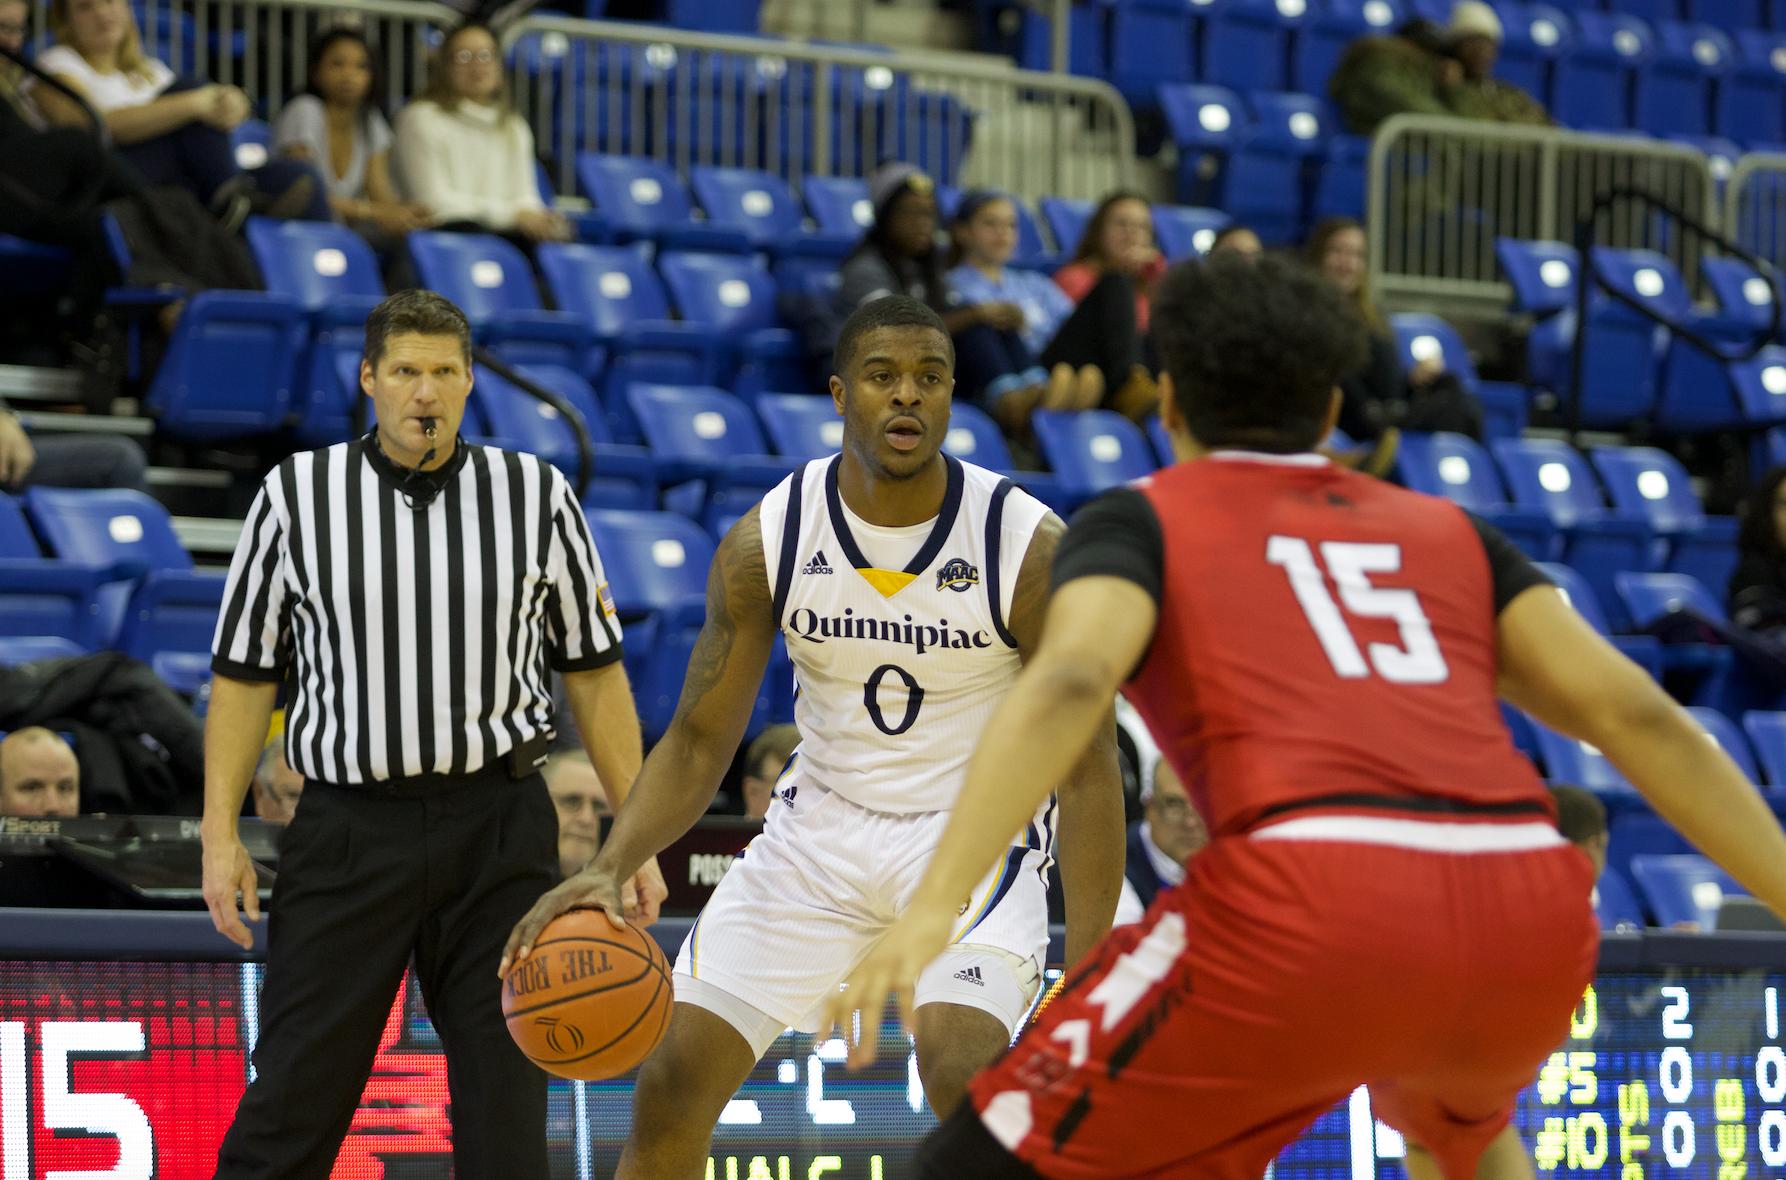 Quinnipiac men's basketball drops home opener to Hartford, 68-54